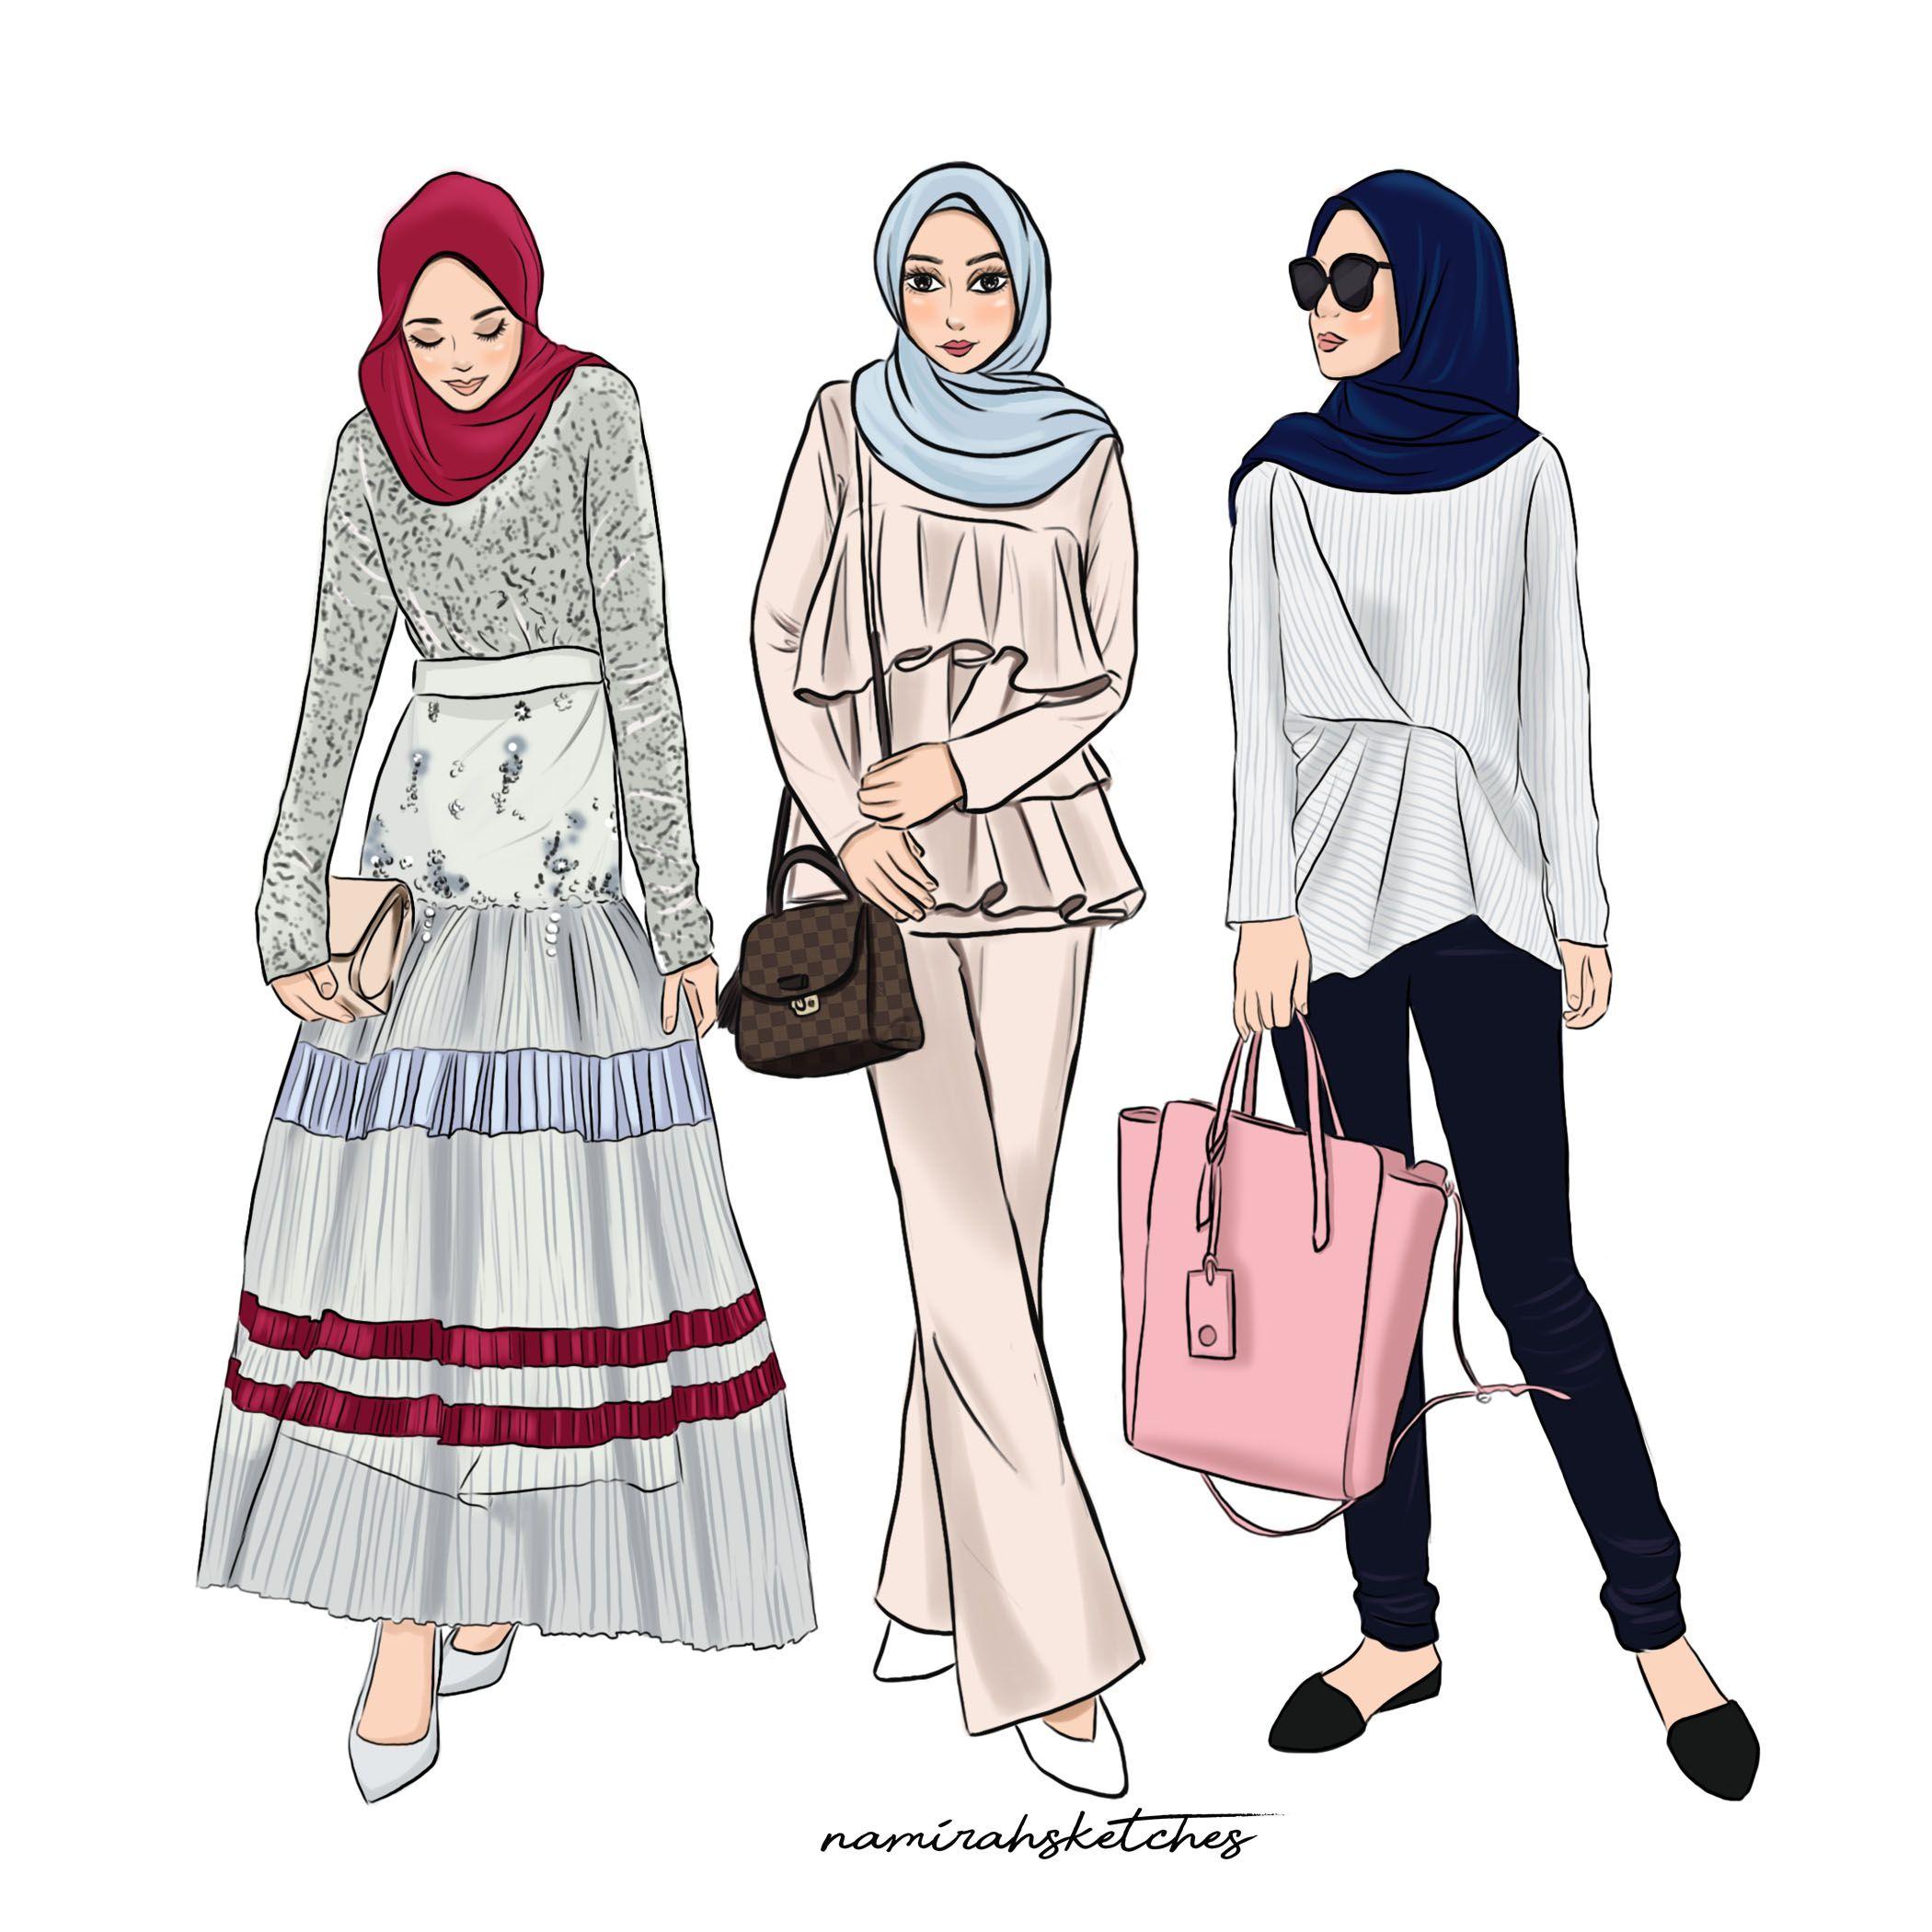 Ameera Zaini Illustration by namirahsketches  Ilustrasi model